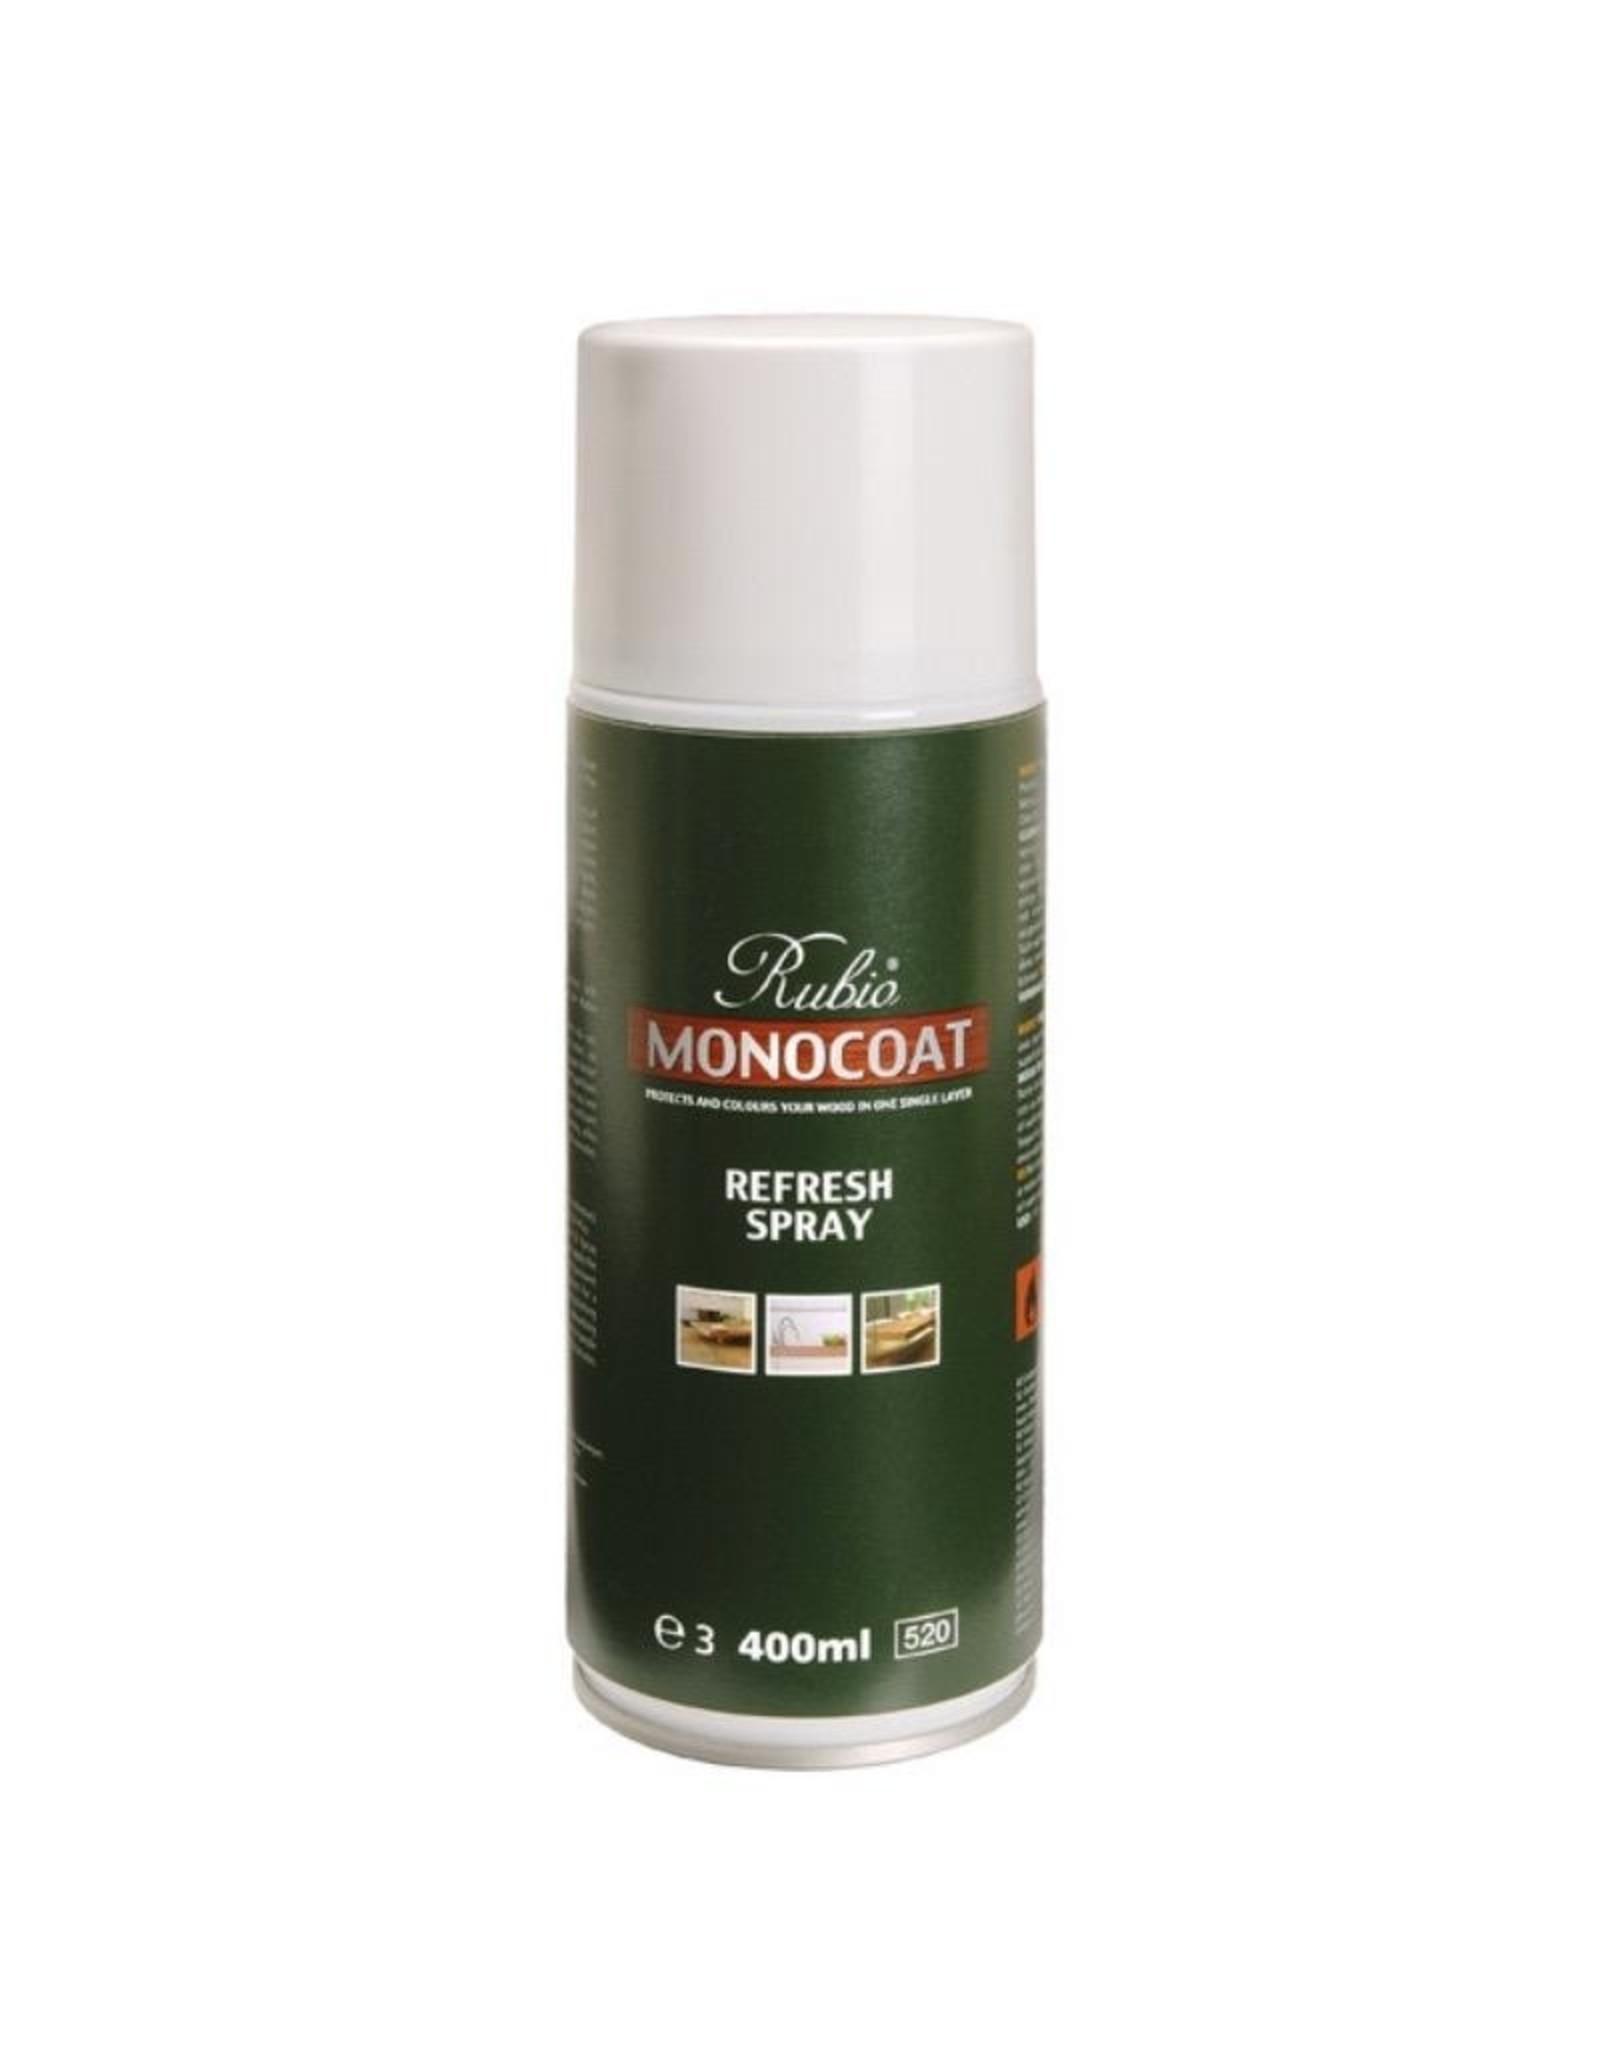 RUBIO MONOCOAT Interior Refresh Spray 400ml